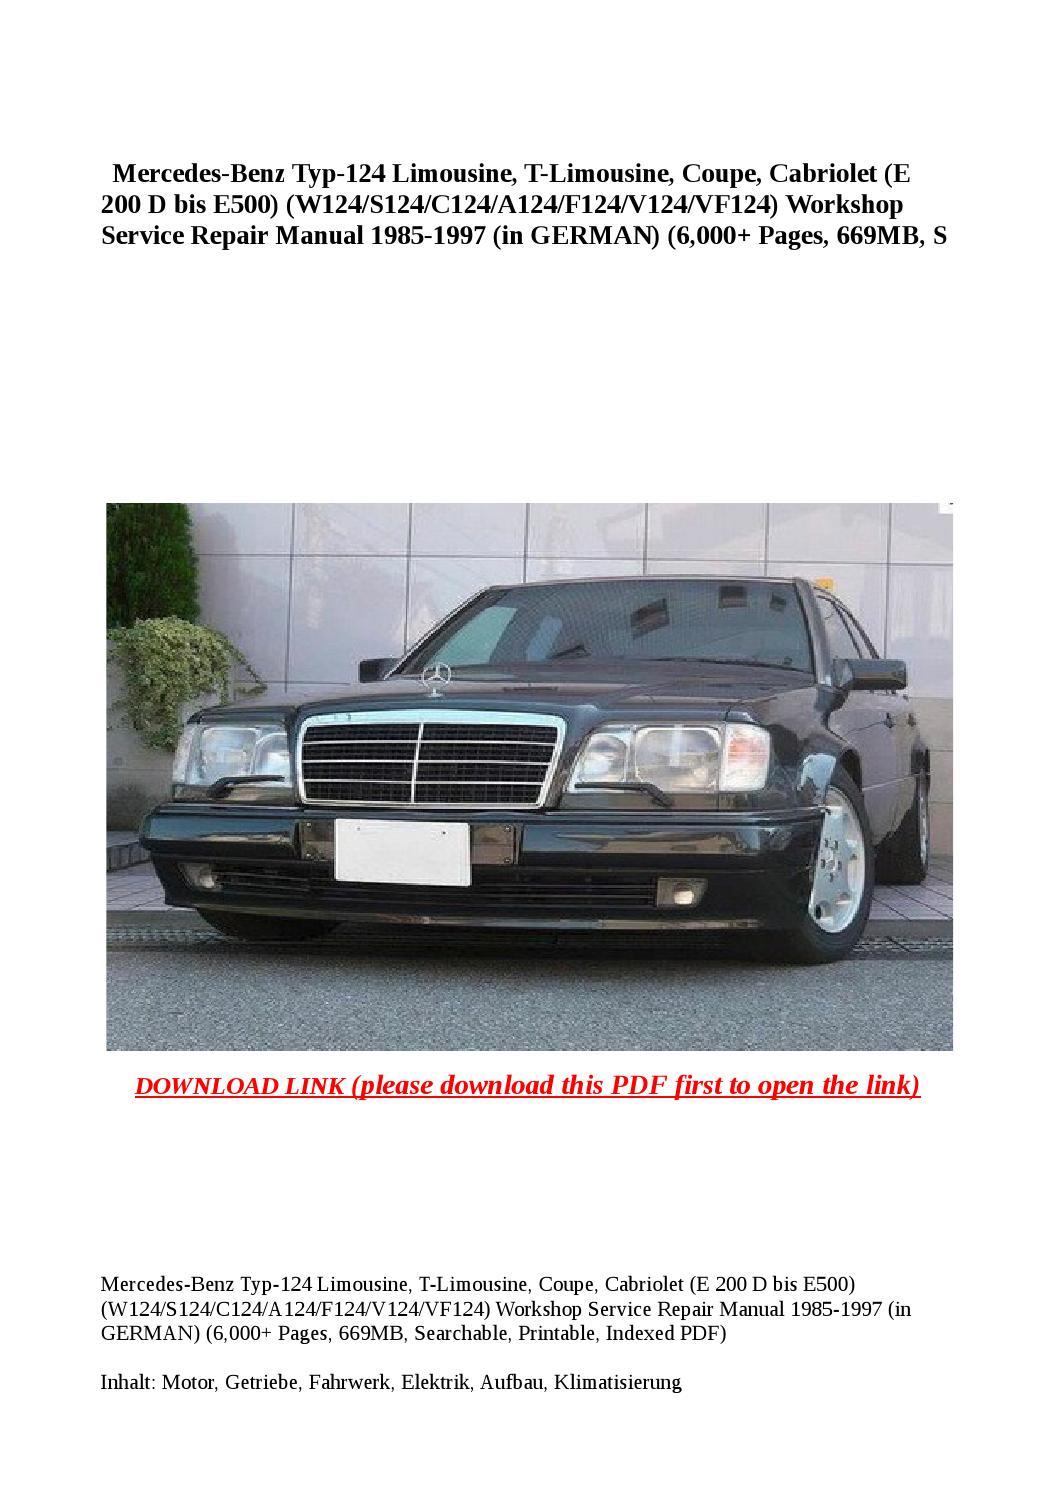 Mercedes benz typ 124 limousine t limousine coupe for Service plan b mercedes benz